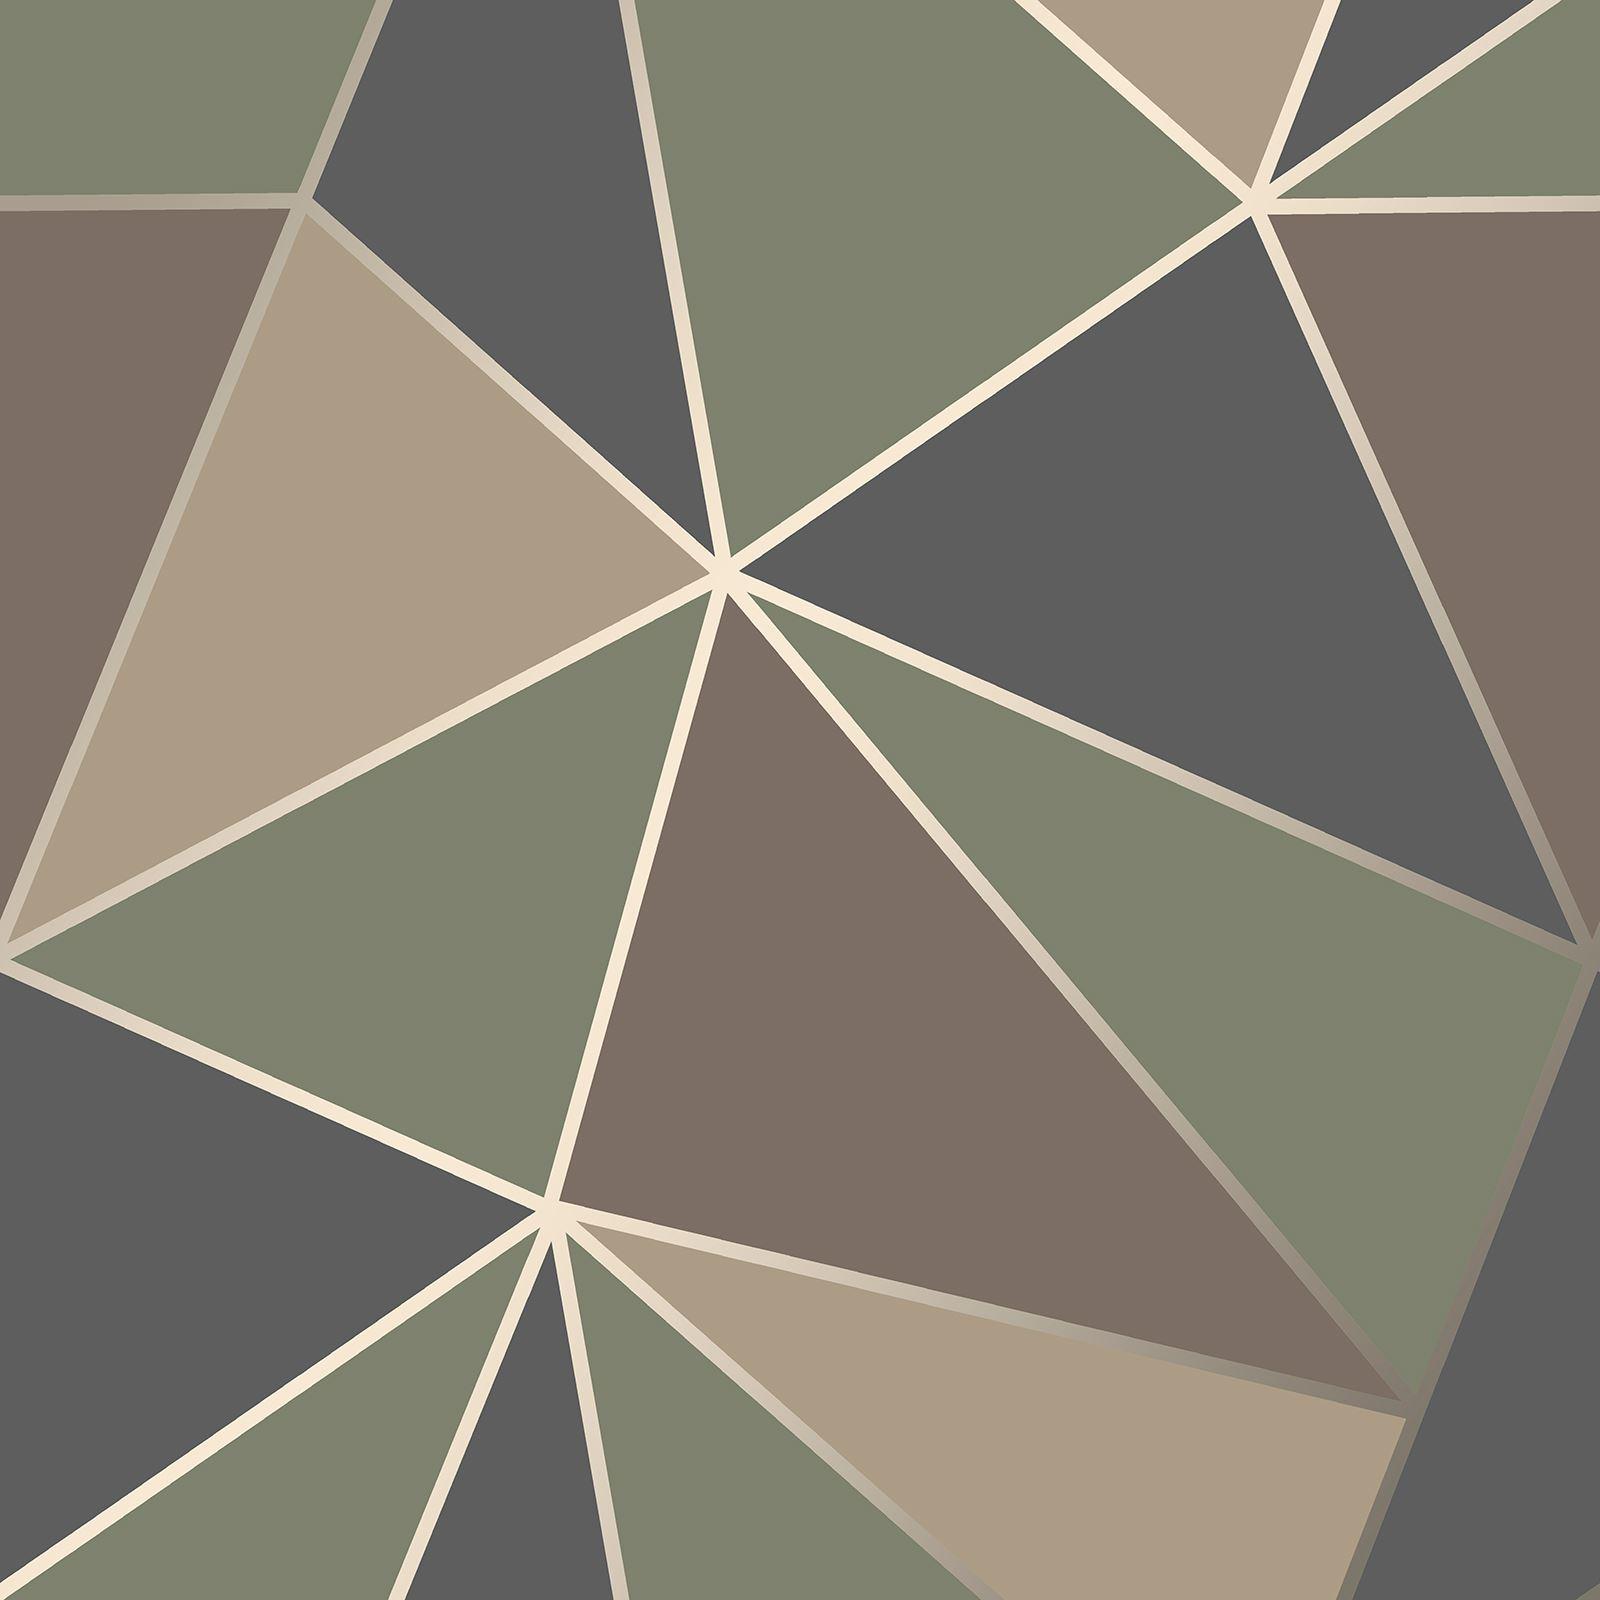 Apex Geo Wallpaper Rose Gold: GEOMETRIC WALLPAPER MODERN DECOR TRIANGLES TRELLIS SILVER ROSE GOLD METALLIC